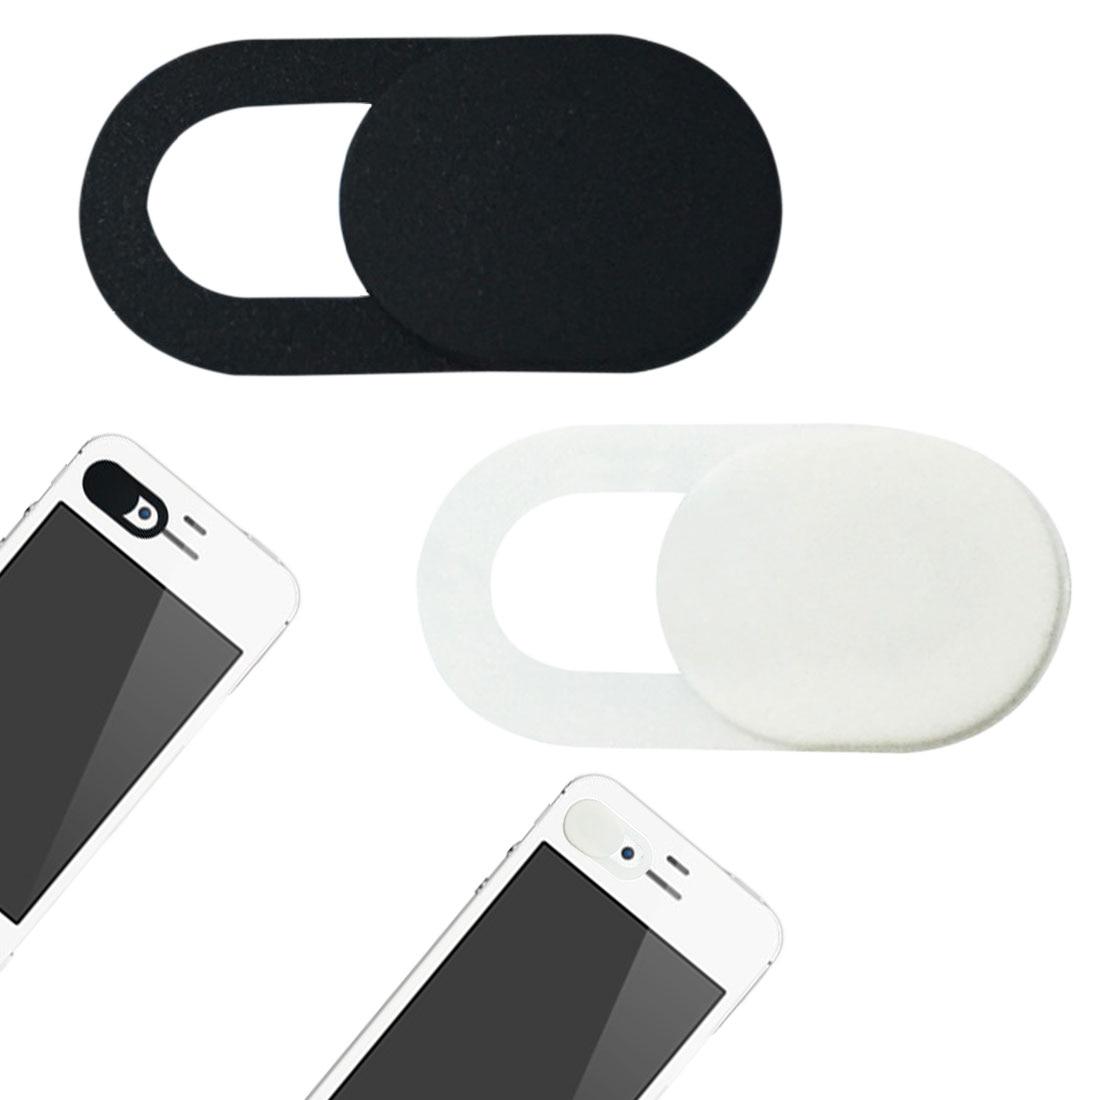 6pc Webcam Shutter Slider Plastic Camera Cover Sticker Ipad Phone Web Laptop Mac